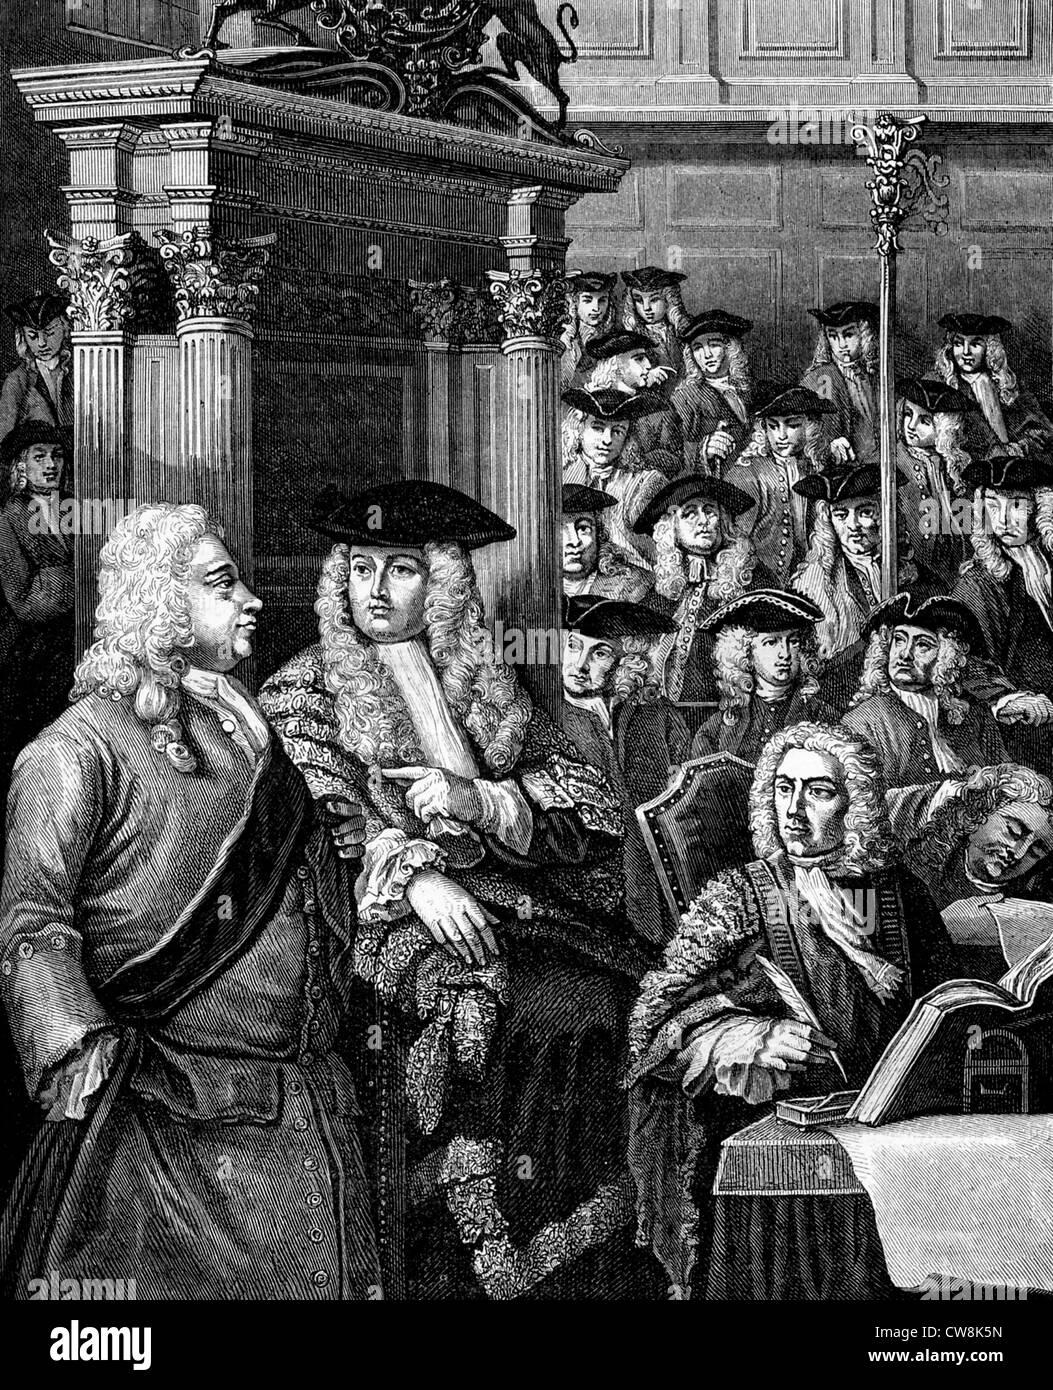 Sir Robert Walpole - Stock Image